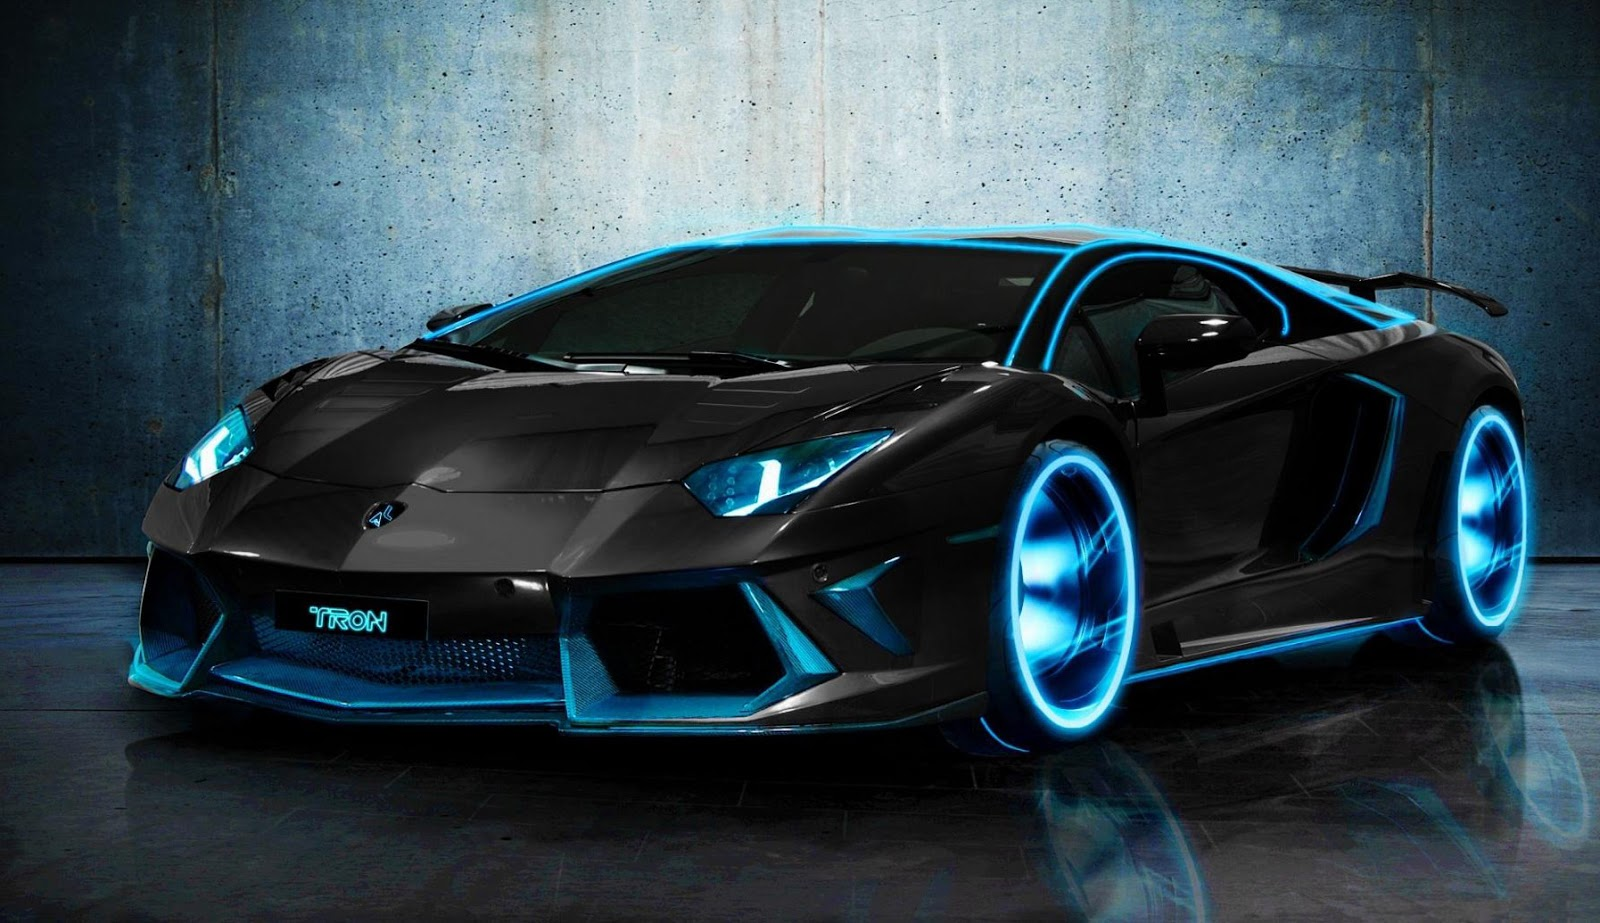 car sports car sports car sports car sports car sports car sports car 1600x923